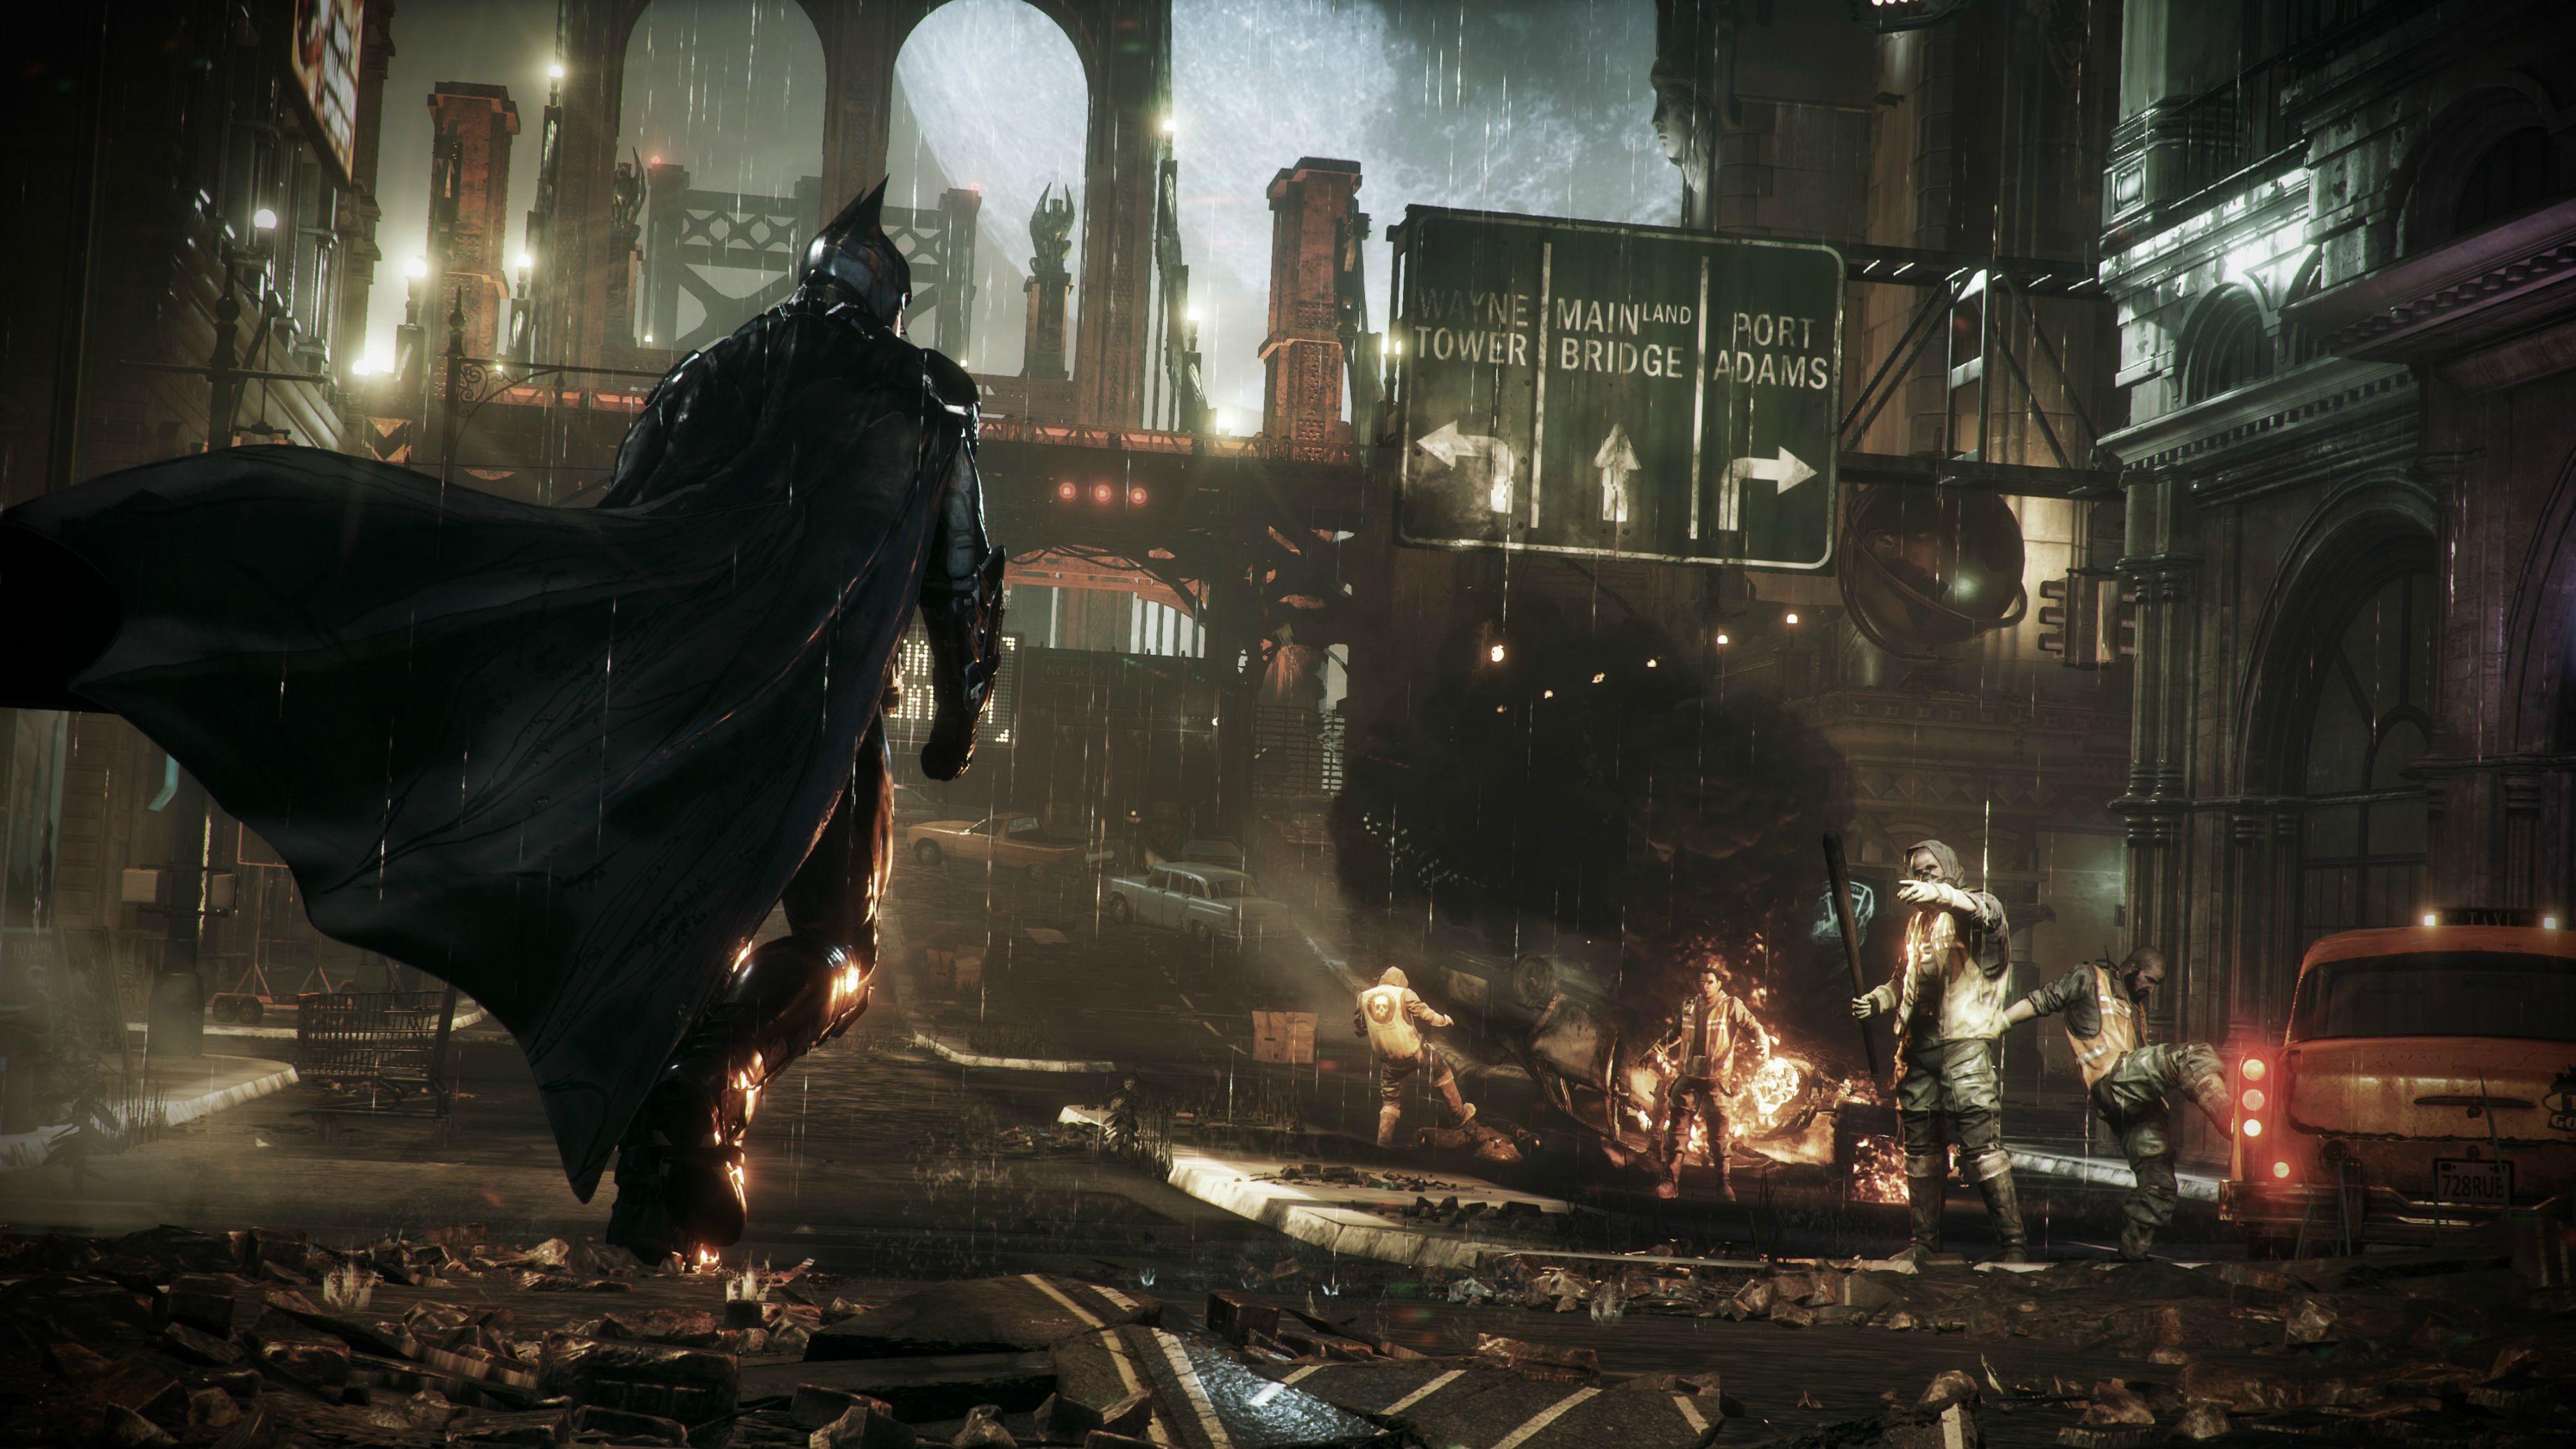 Batman Arkham Knight 4K